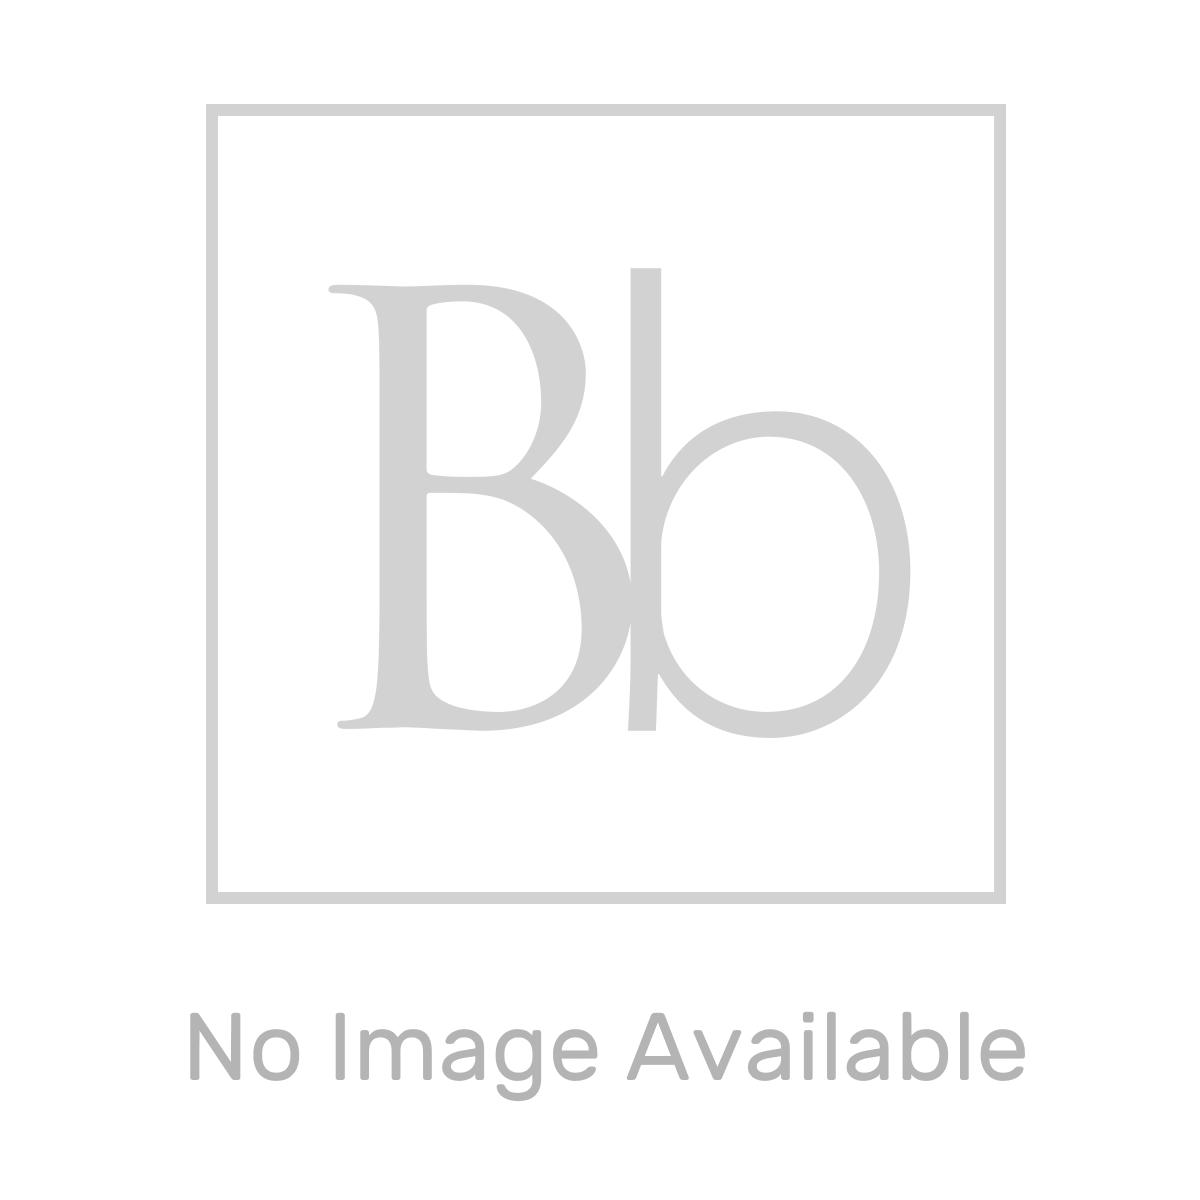 Aquadart Black Slate Shower Tray 1600 x 900 Overhead